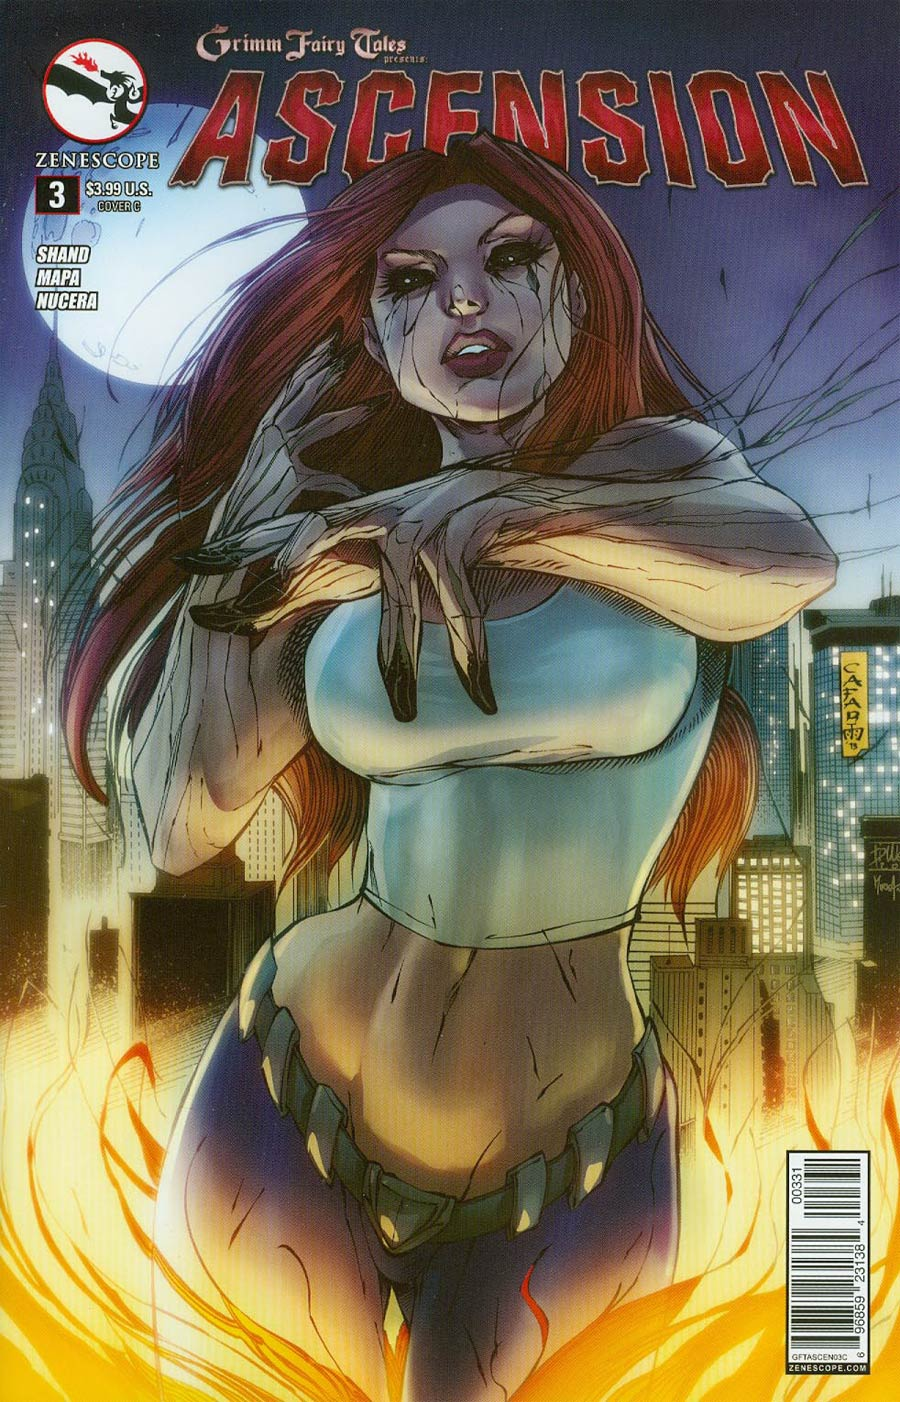 Grimm Fairy Tales Presents Ascension #3 Cover C Giuseppe Cafaro